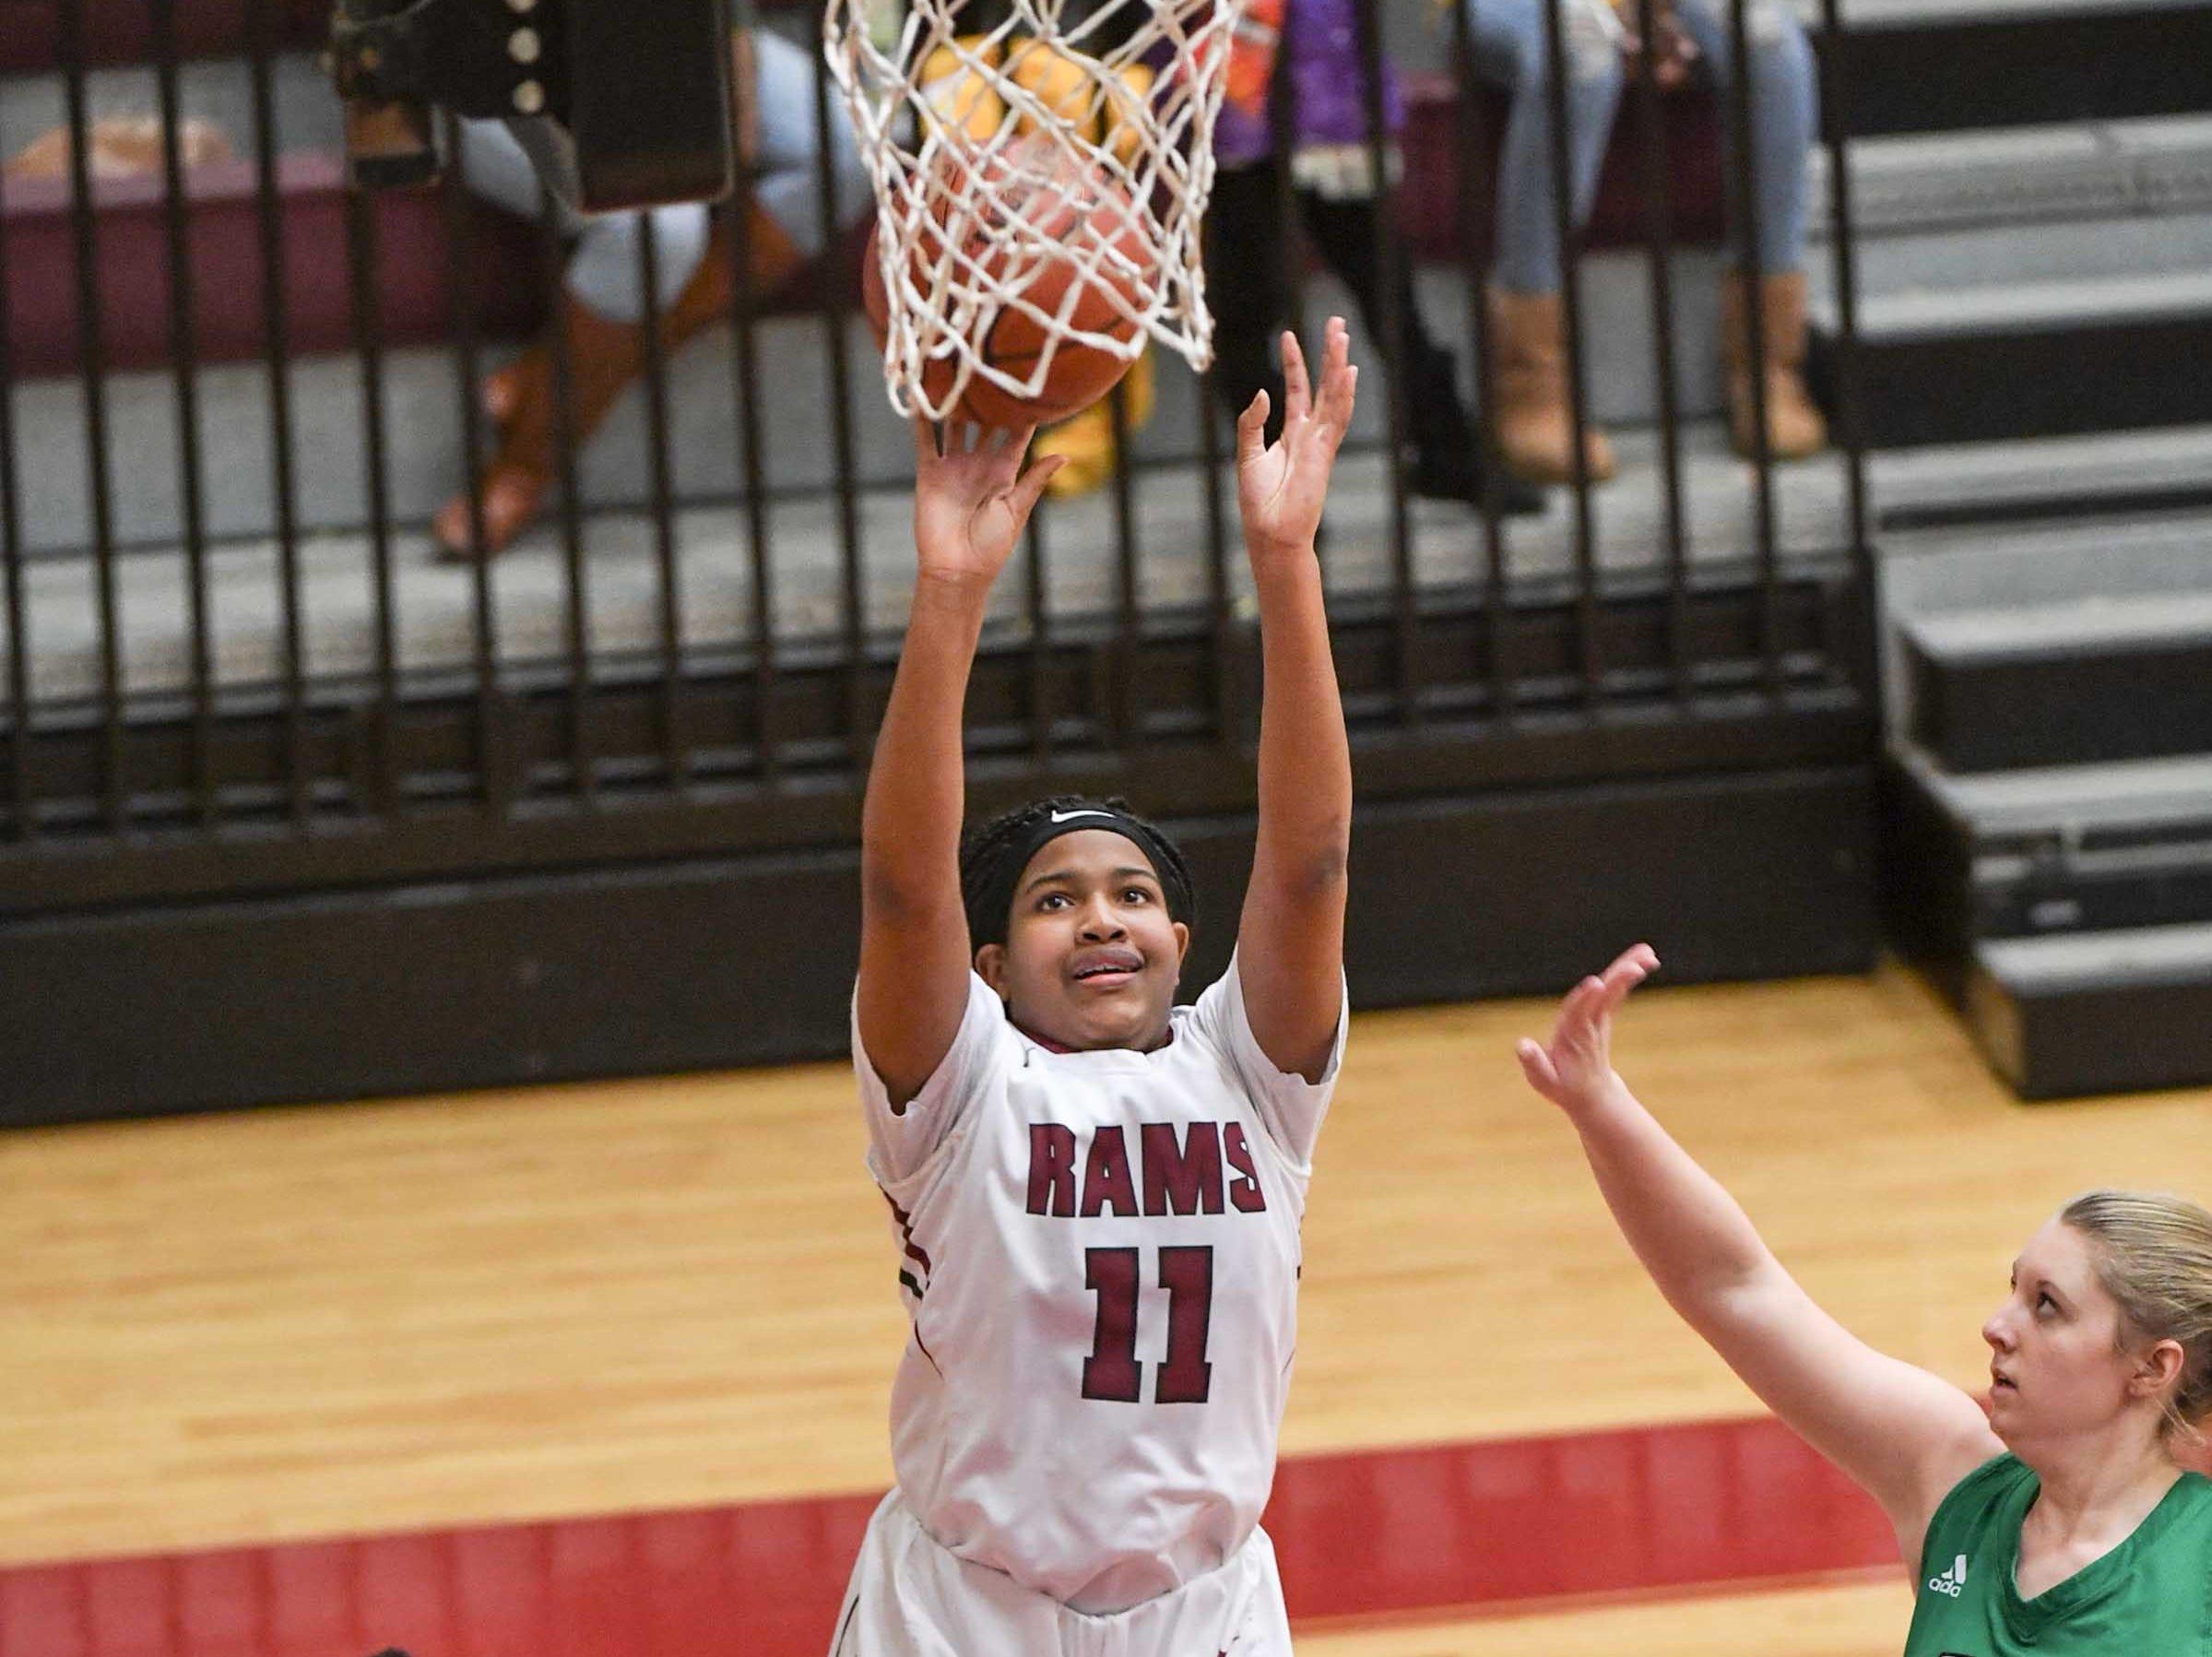 Westside freshman Destiny Middleton(11) shoots near Easley sophomore Kaitlin Fuller(11) during the third quarter at Westside High School in Anderson on Friday.